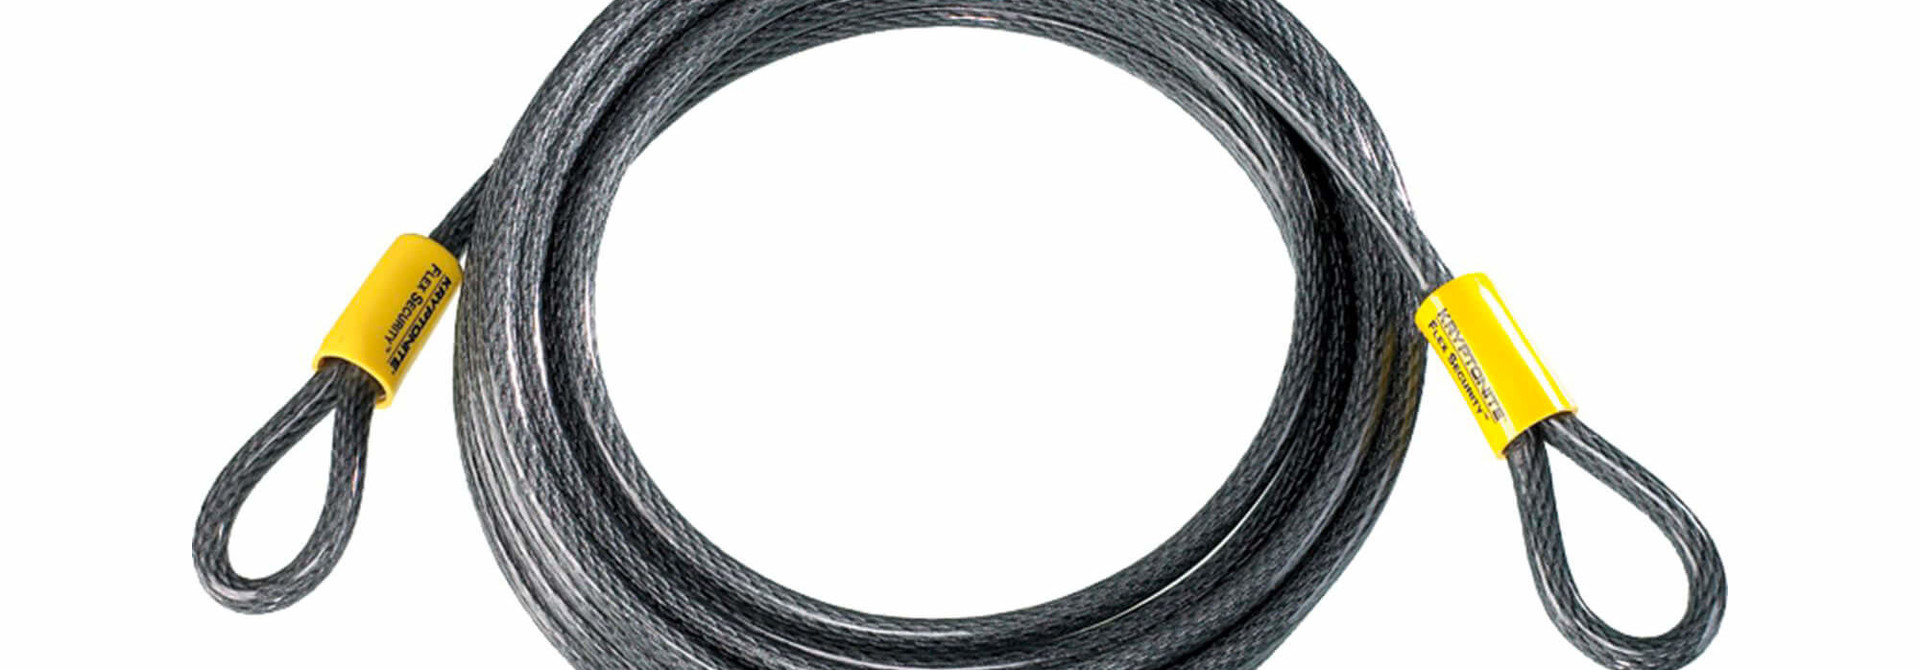 Kryptoflex 3010 Looped Cable 930 cm X 10mm (2T)